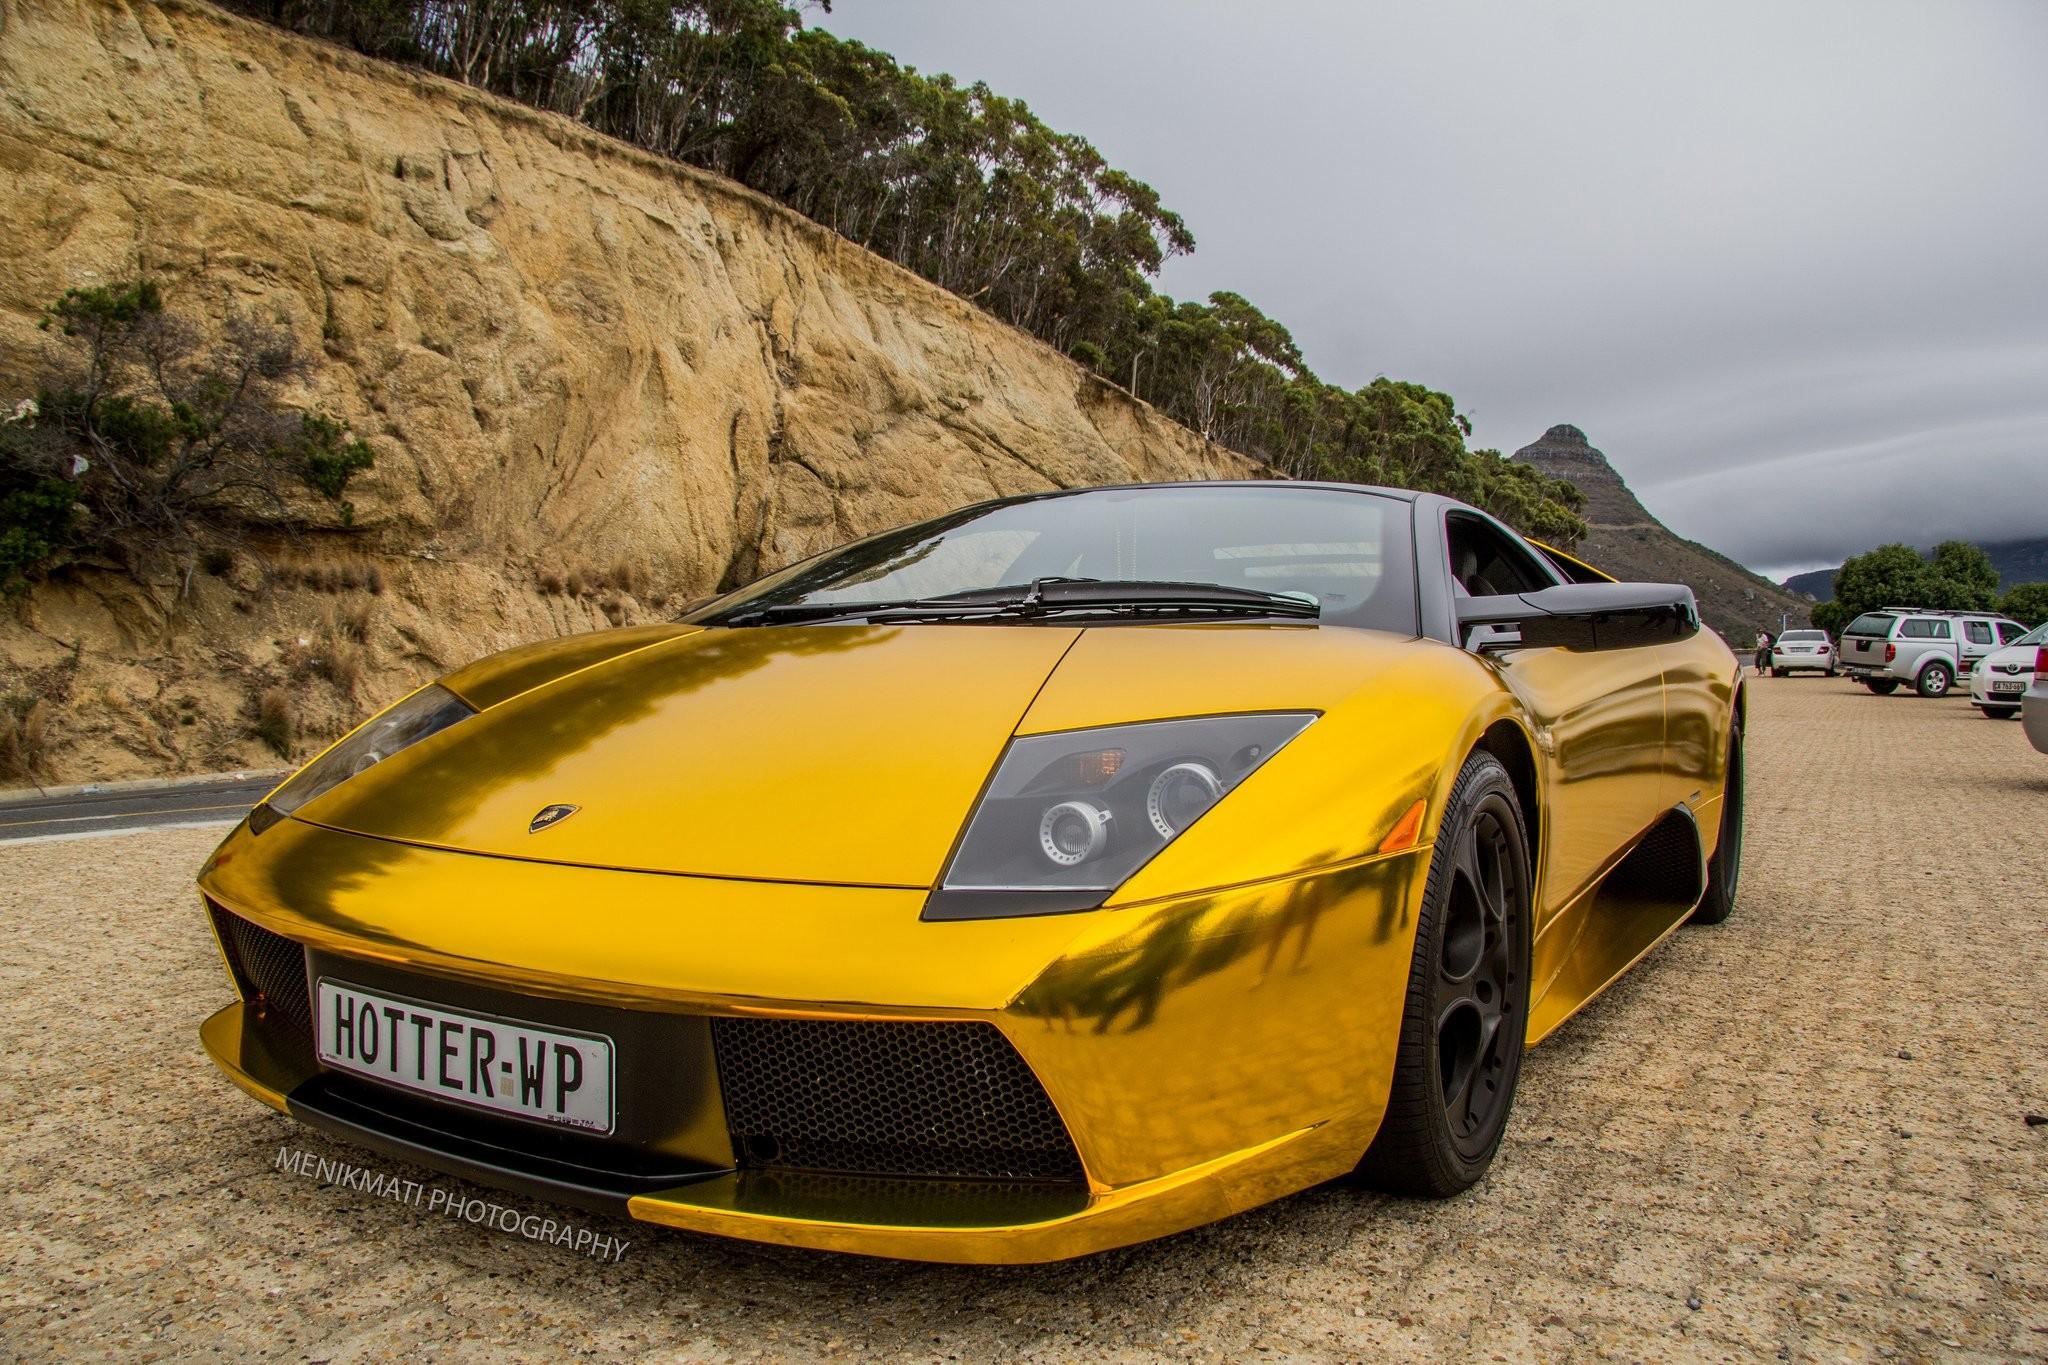 Res: 2048x1365, Lamborghini Murcielago gold chrome coupe Vinyl wrap cars supercars wallpaper       609400   WallpaperUP